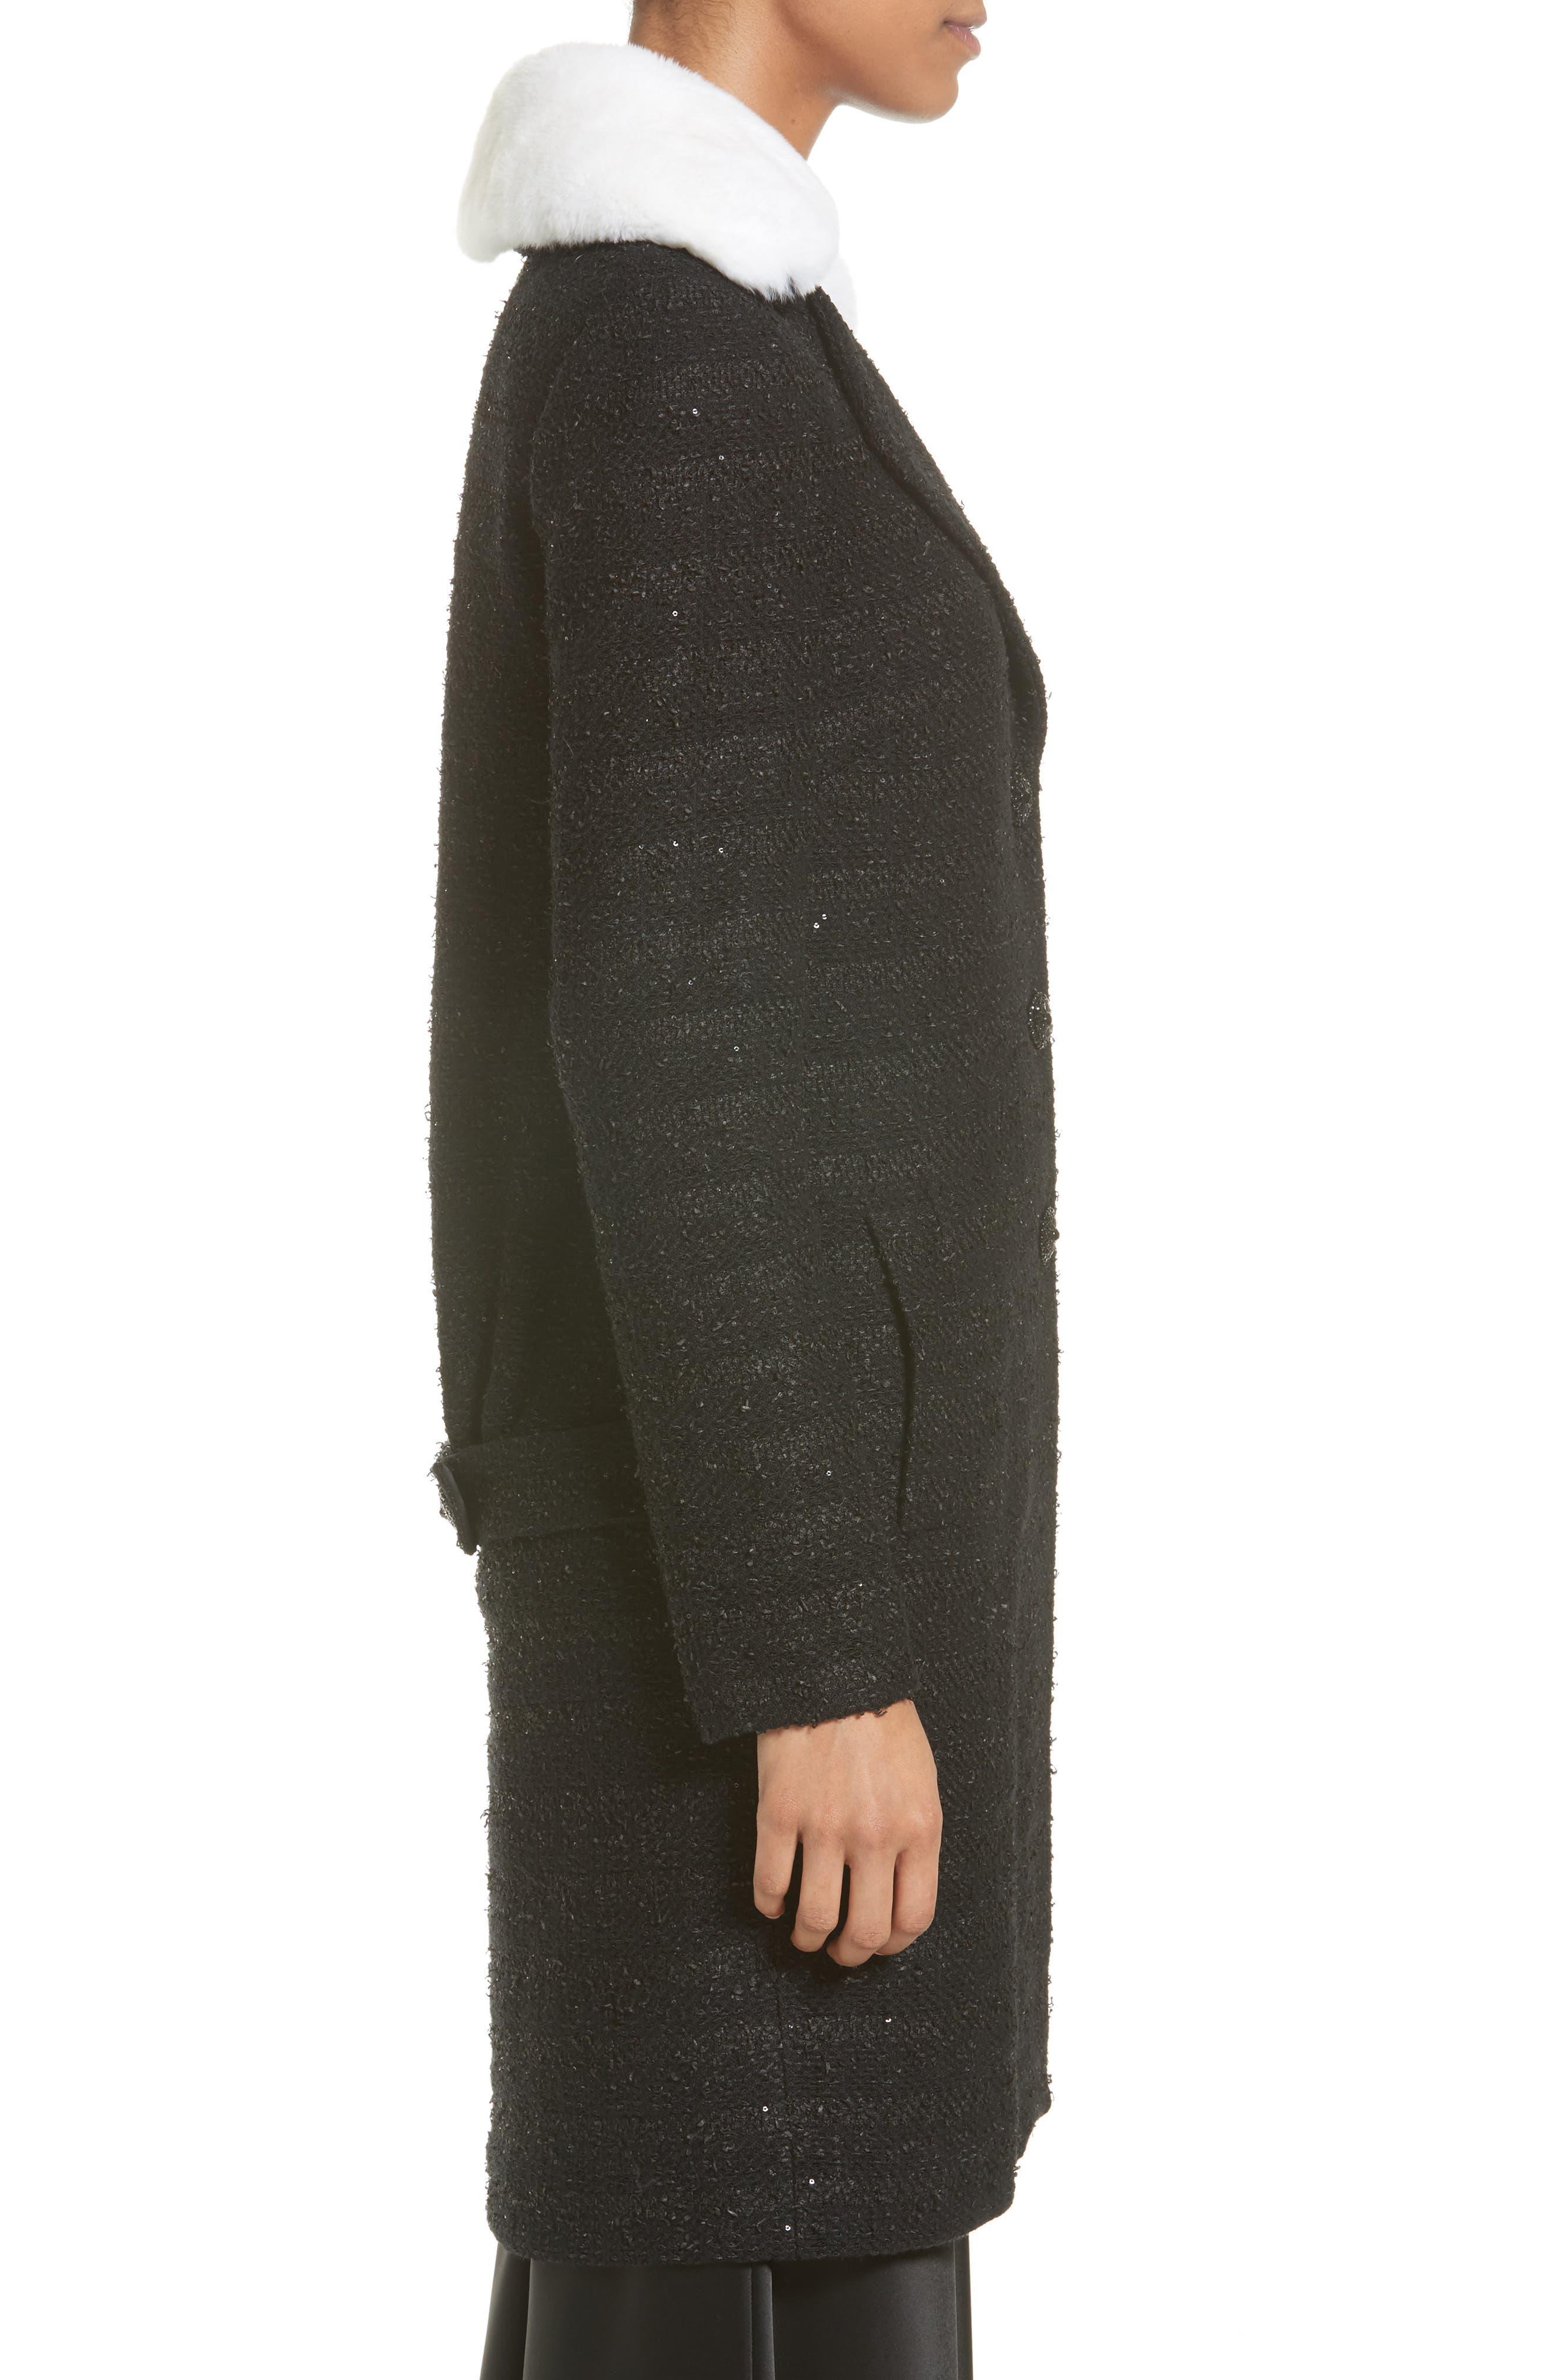 Sequin Knit Topper with Detachable Genuine Rabbit Fur Collar,                             Alternate thumbnail 4, color,                             001